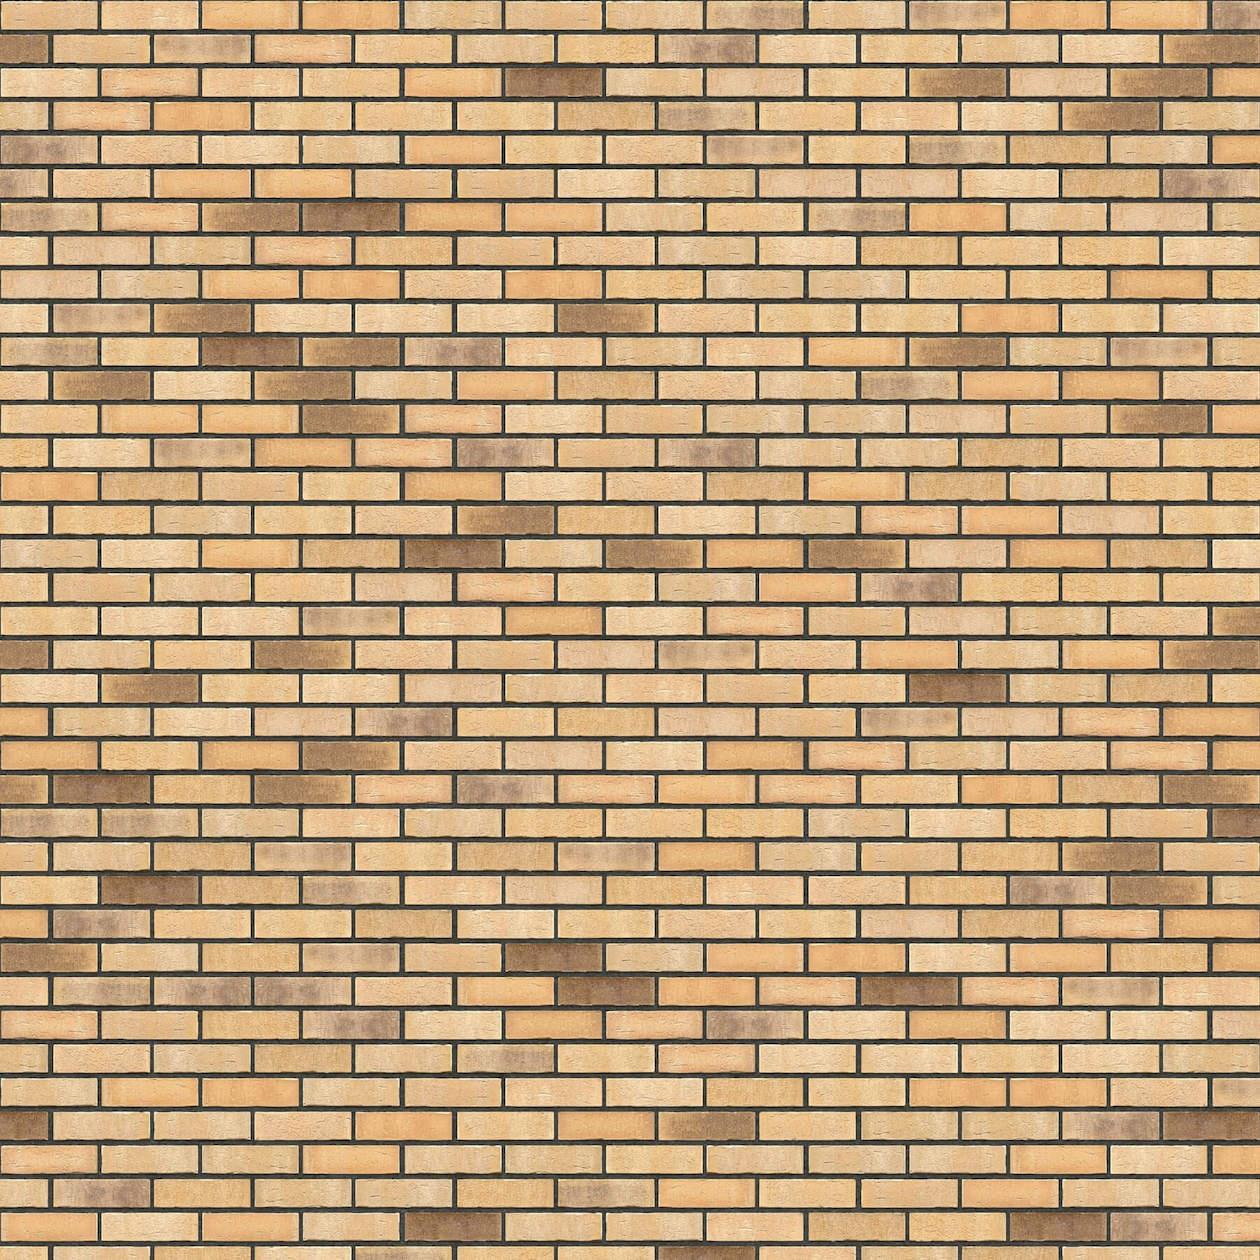 Puna-cigla-FeldHaus-Klinker-brick-house-Beograd-nf-k-723-Antracit Fuga